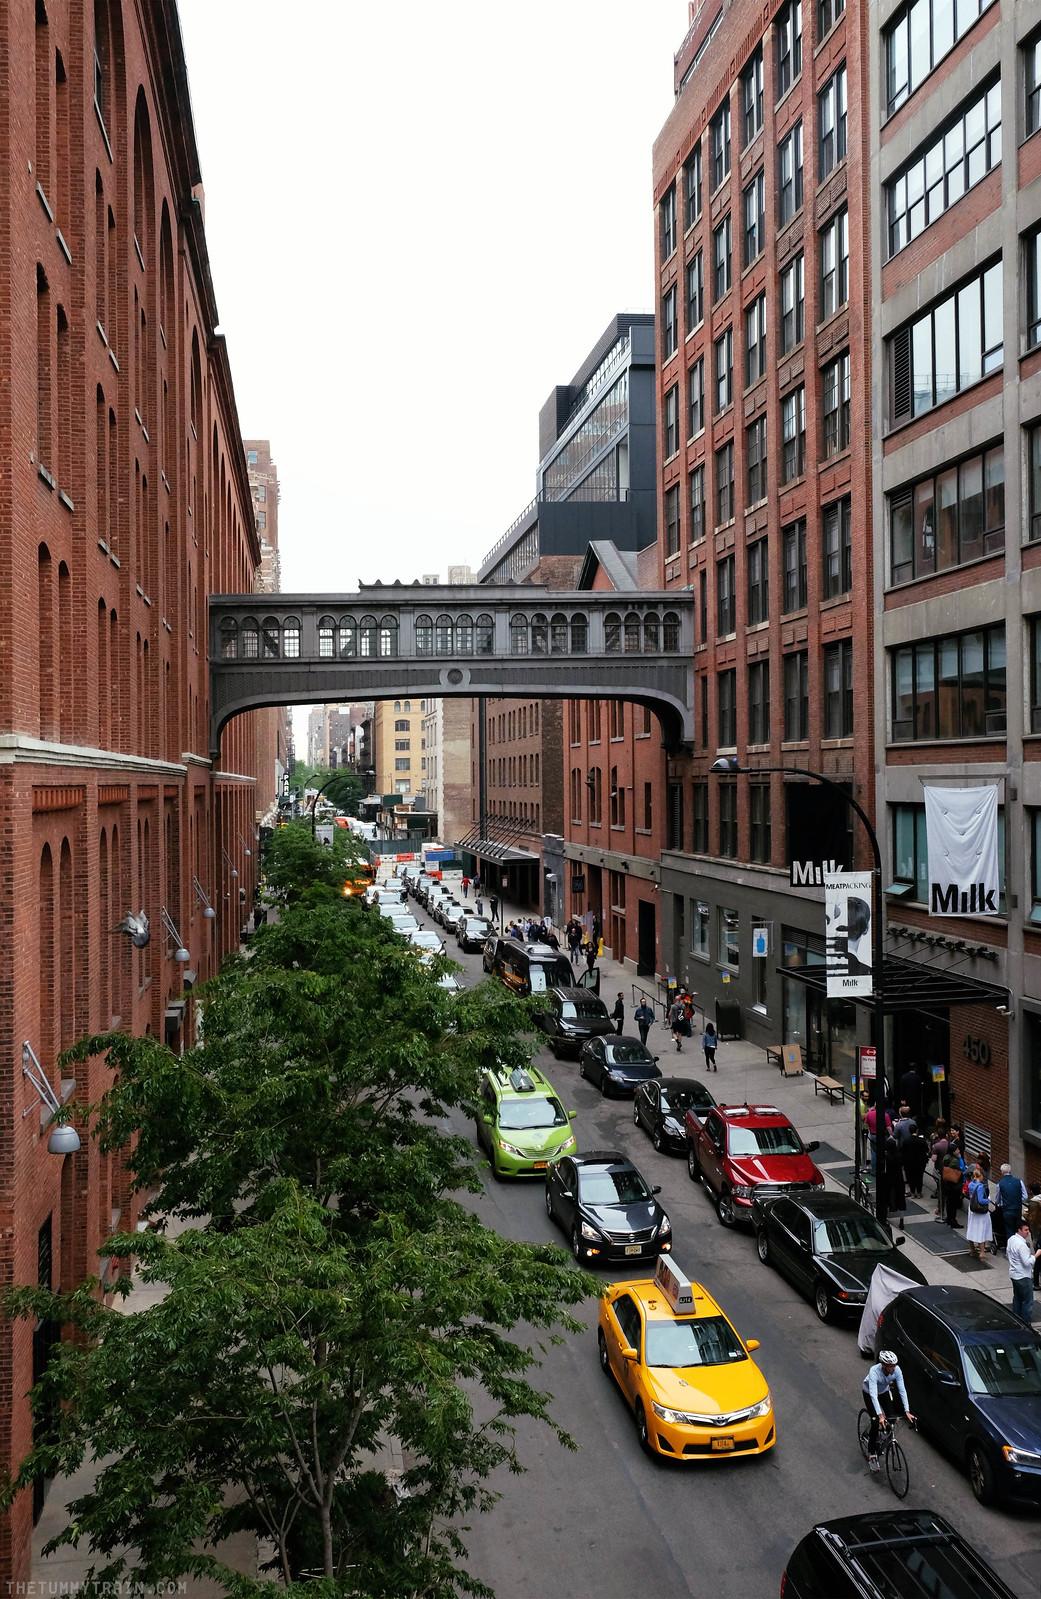 29798482364 da23a7ab22 h - USA 2016 Travel Diary: Walking on The High Line